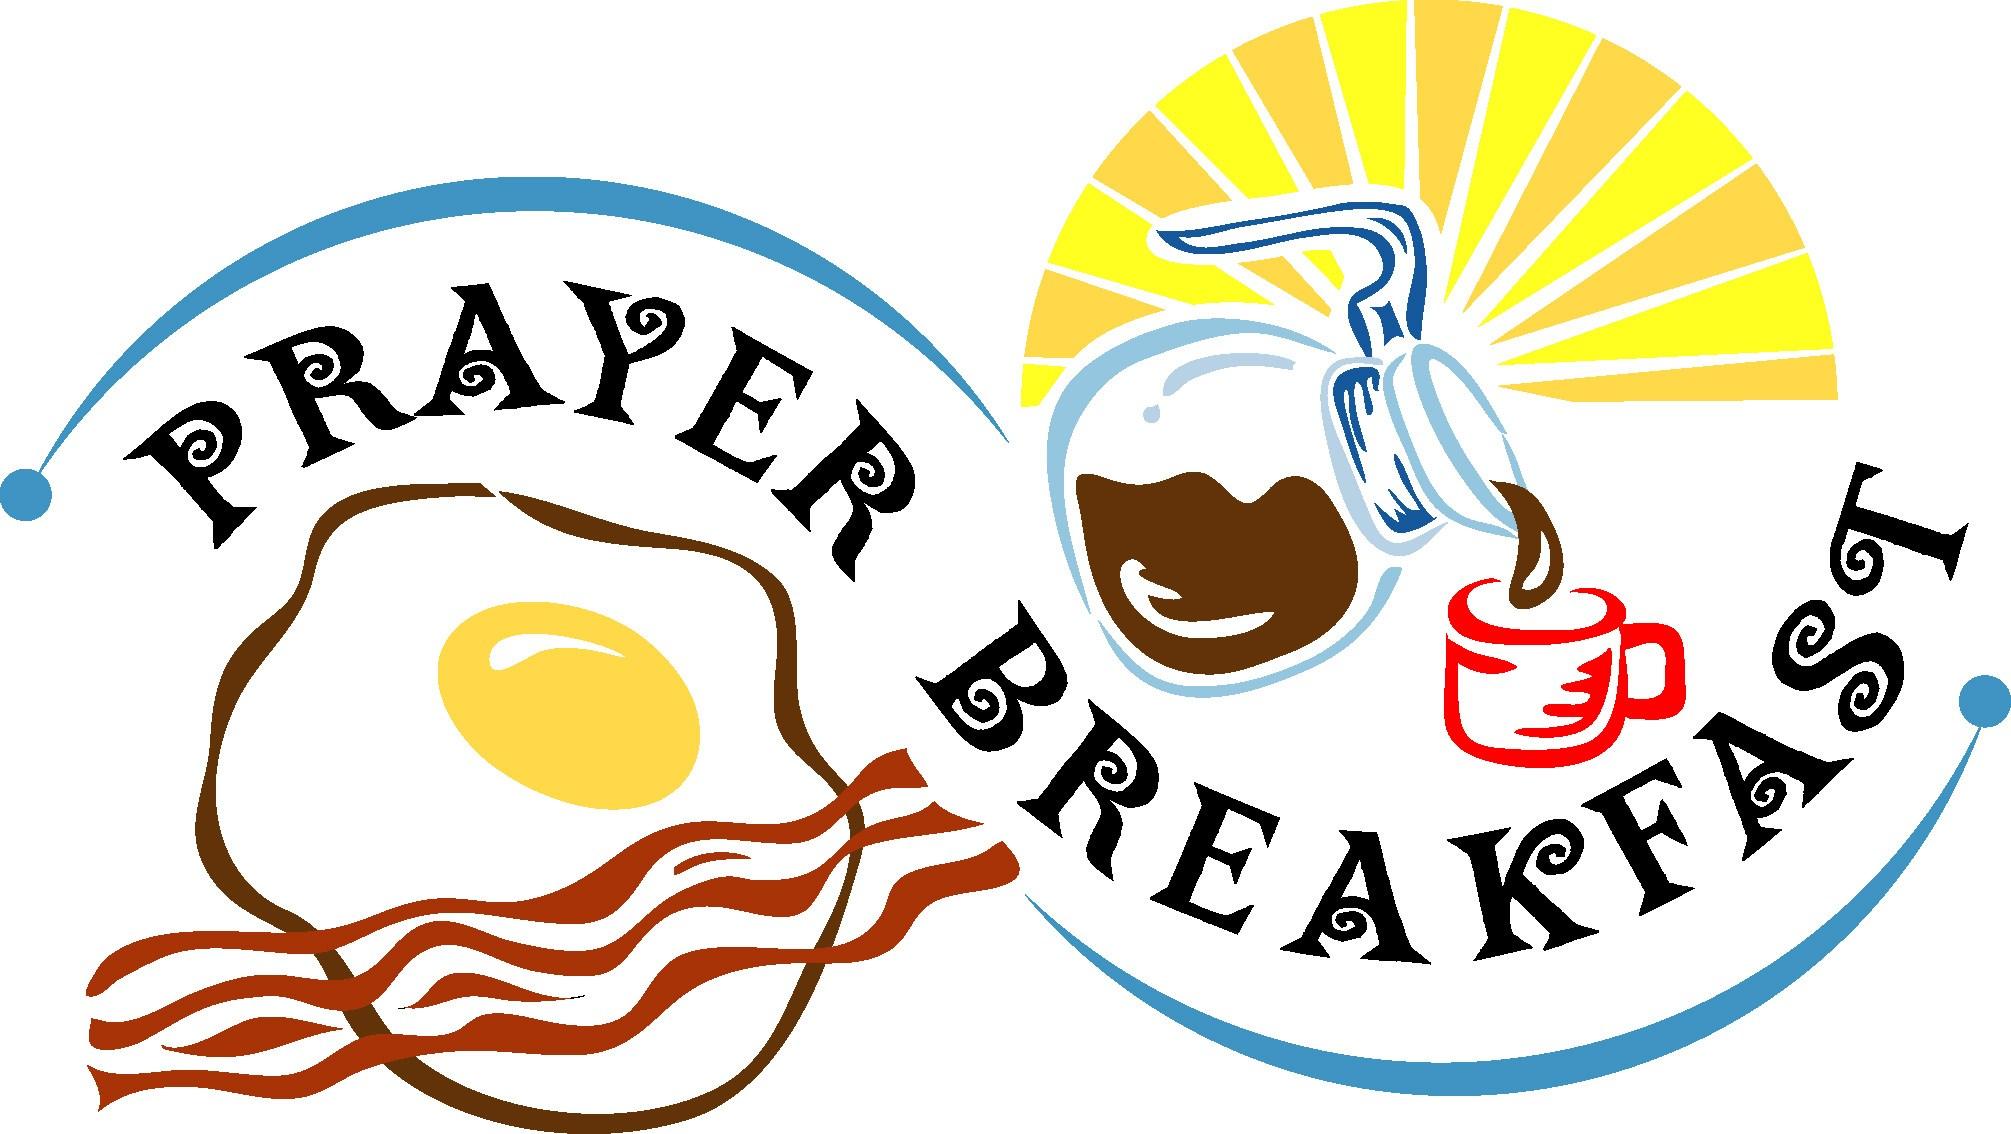 Church breakfast clipart 7 » Clipart Portal.